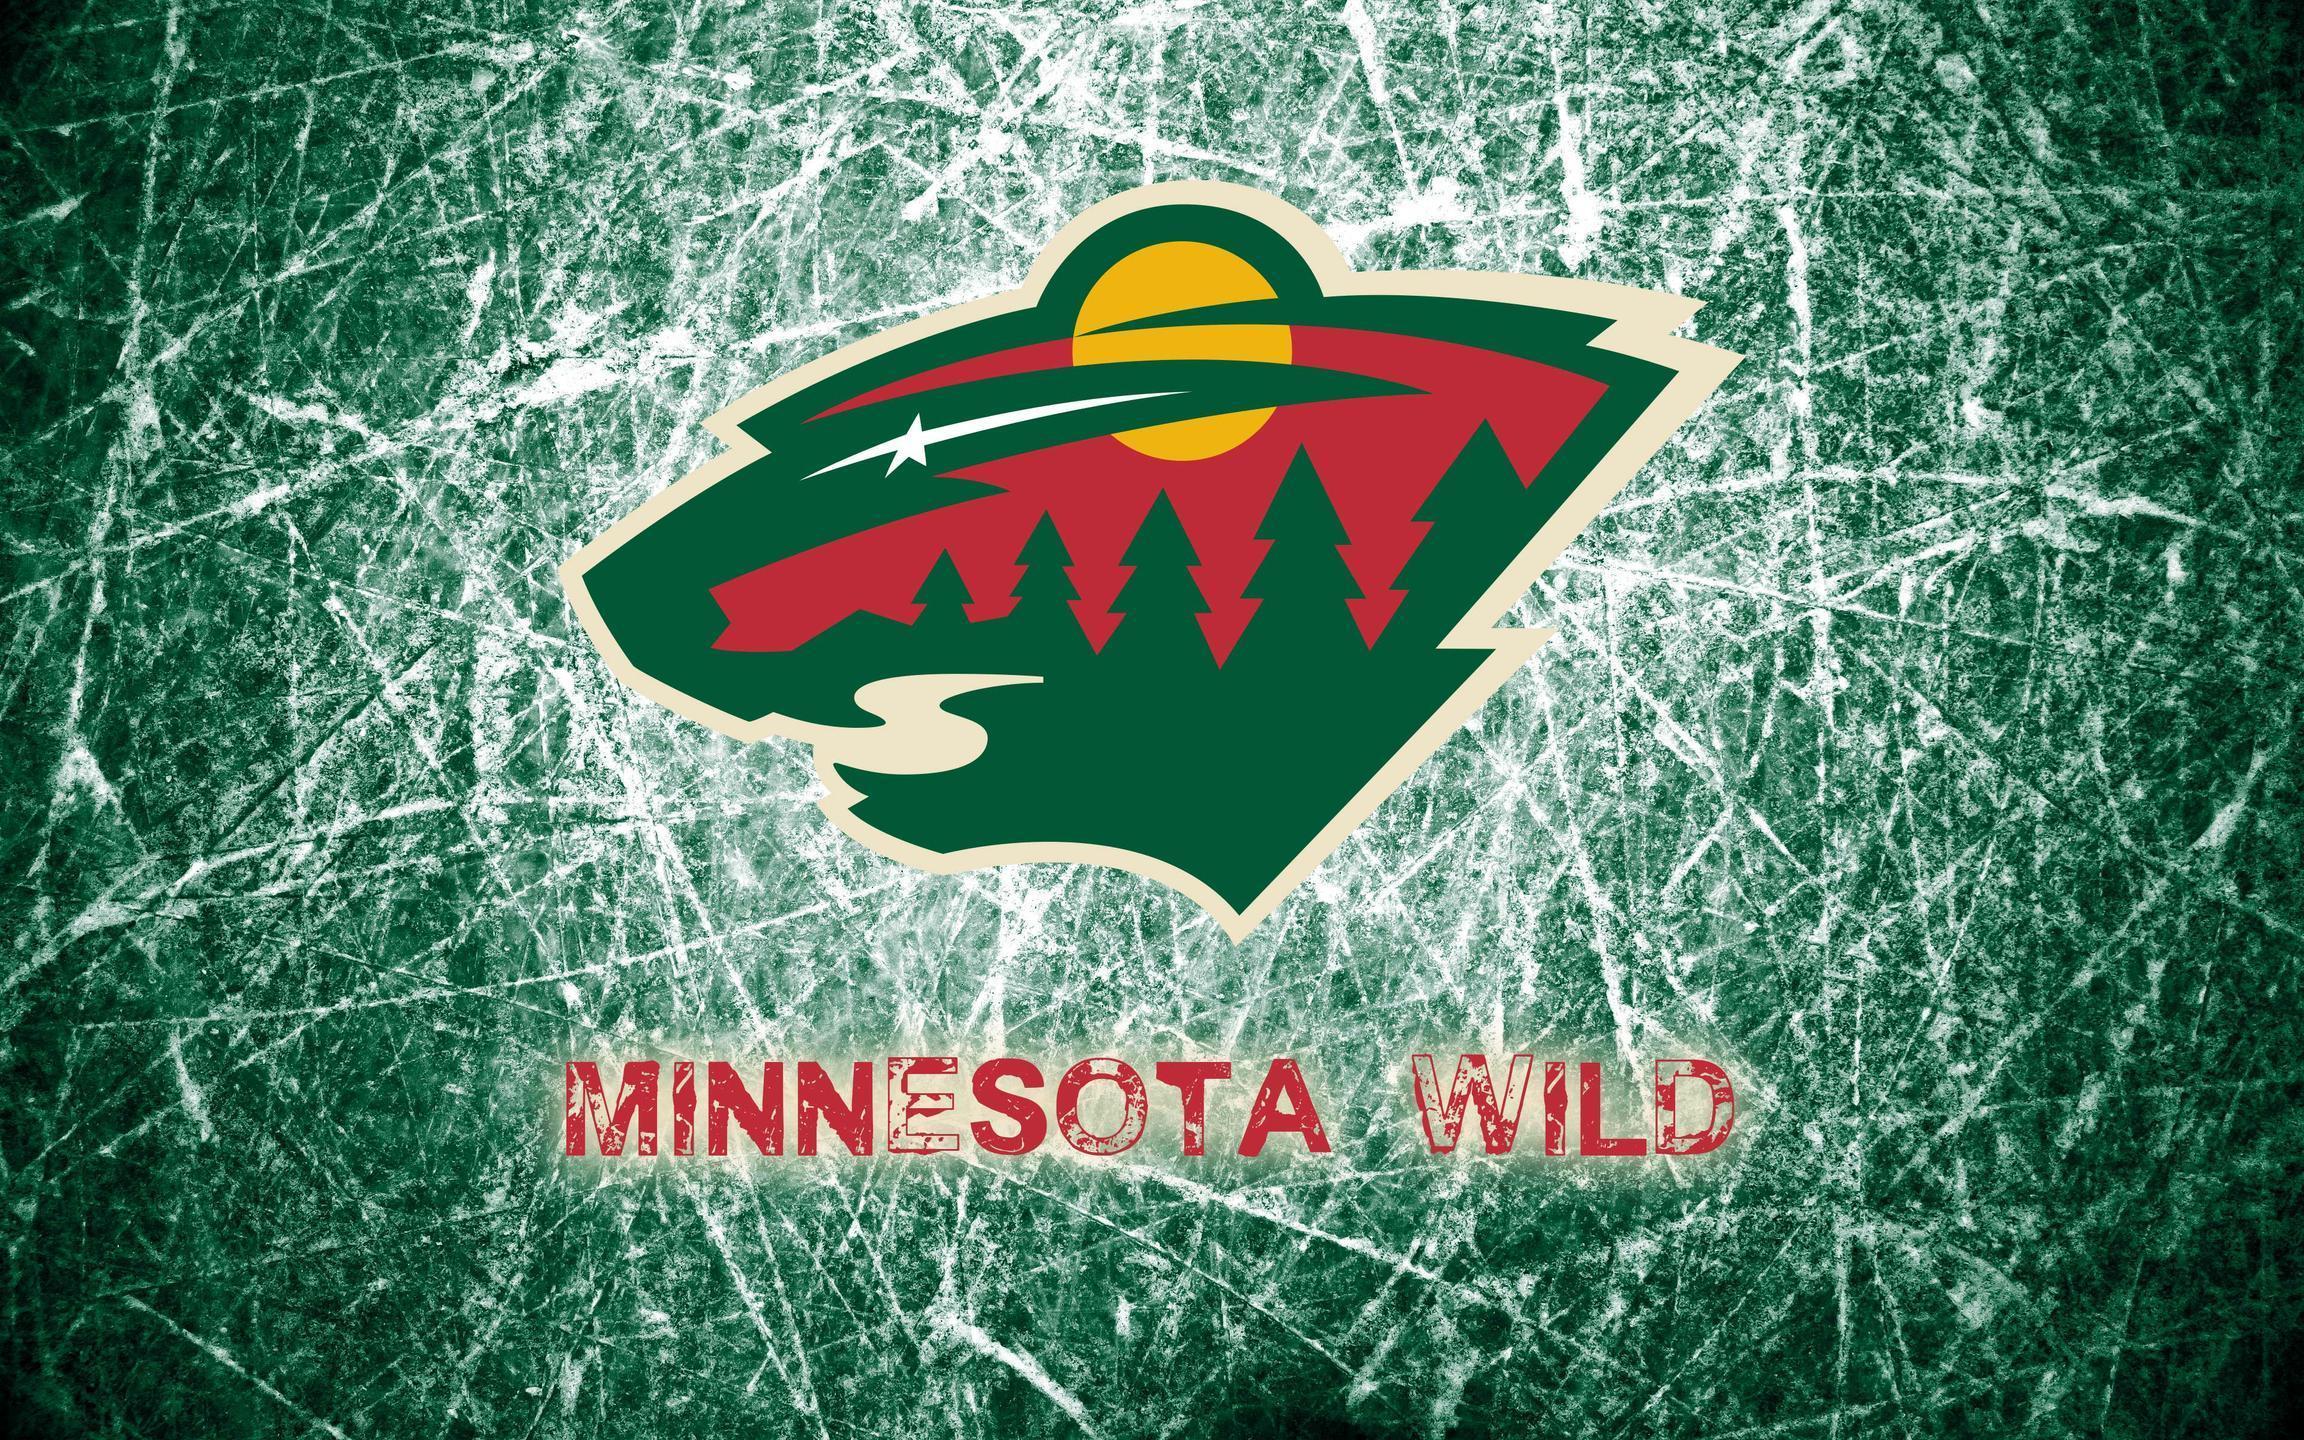 minnesota wild 2014 logo wallpaper wide or hd sports wallpapers